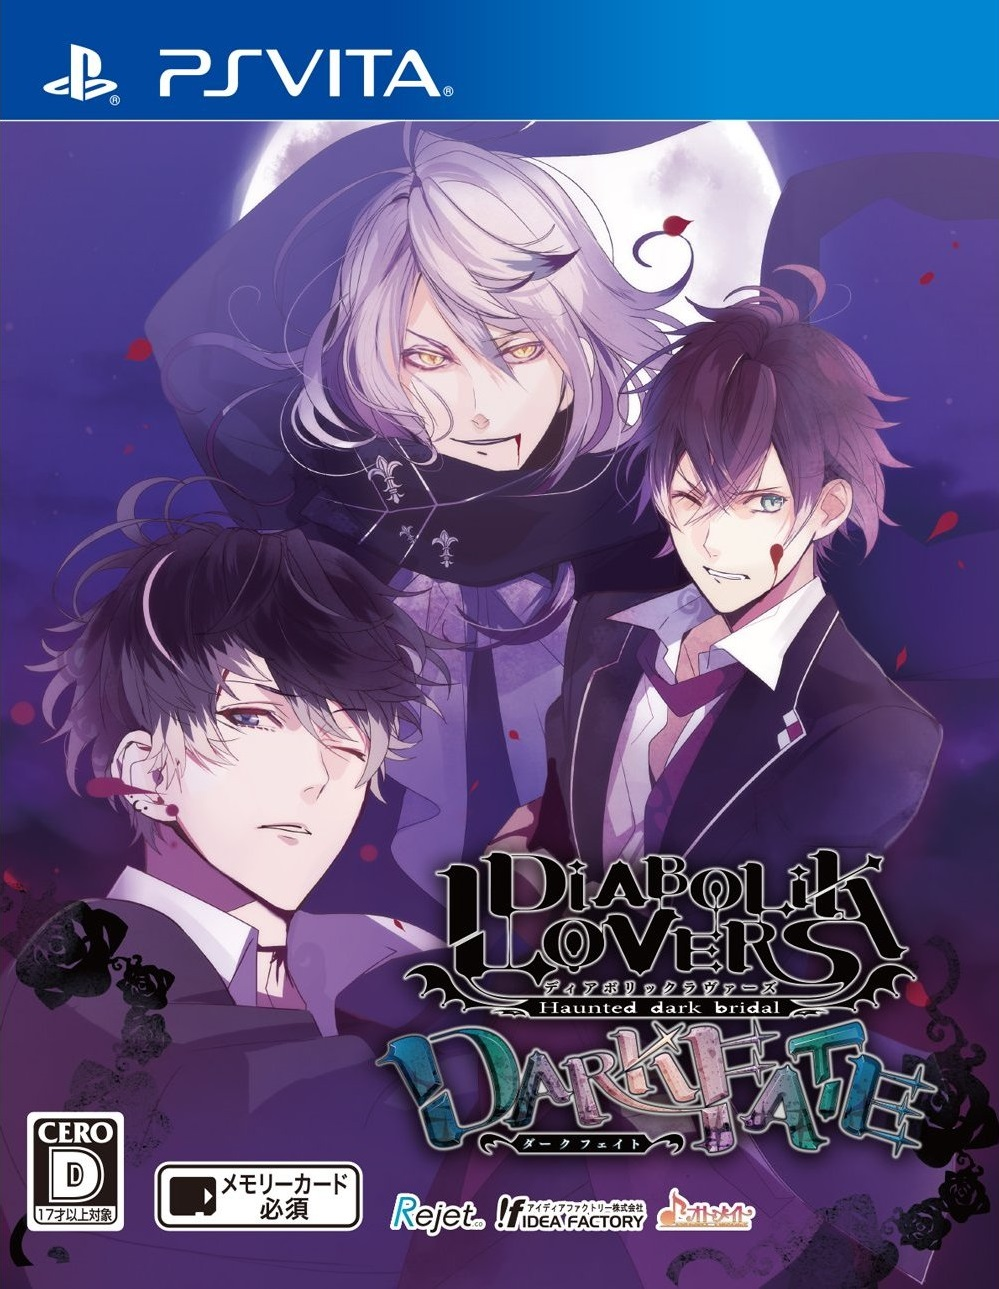 Diabolik Lovers DARK FATE